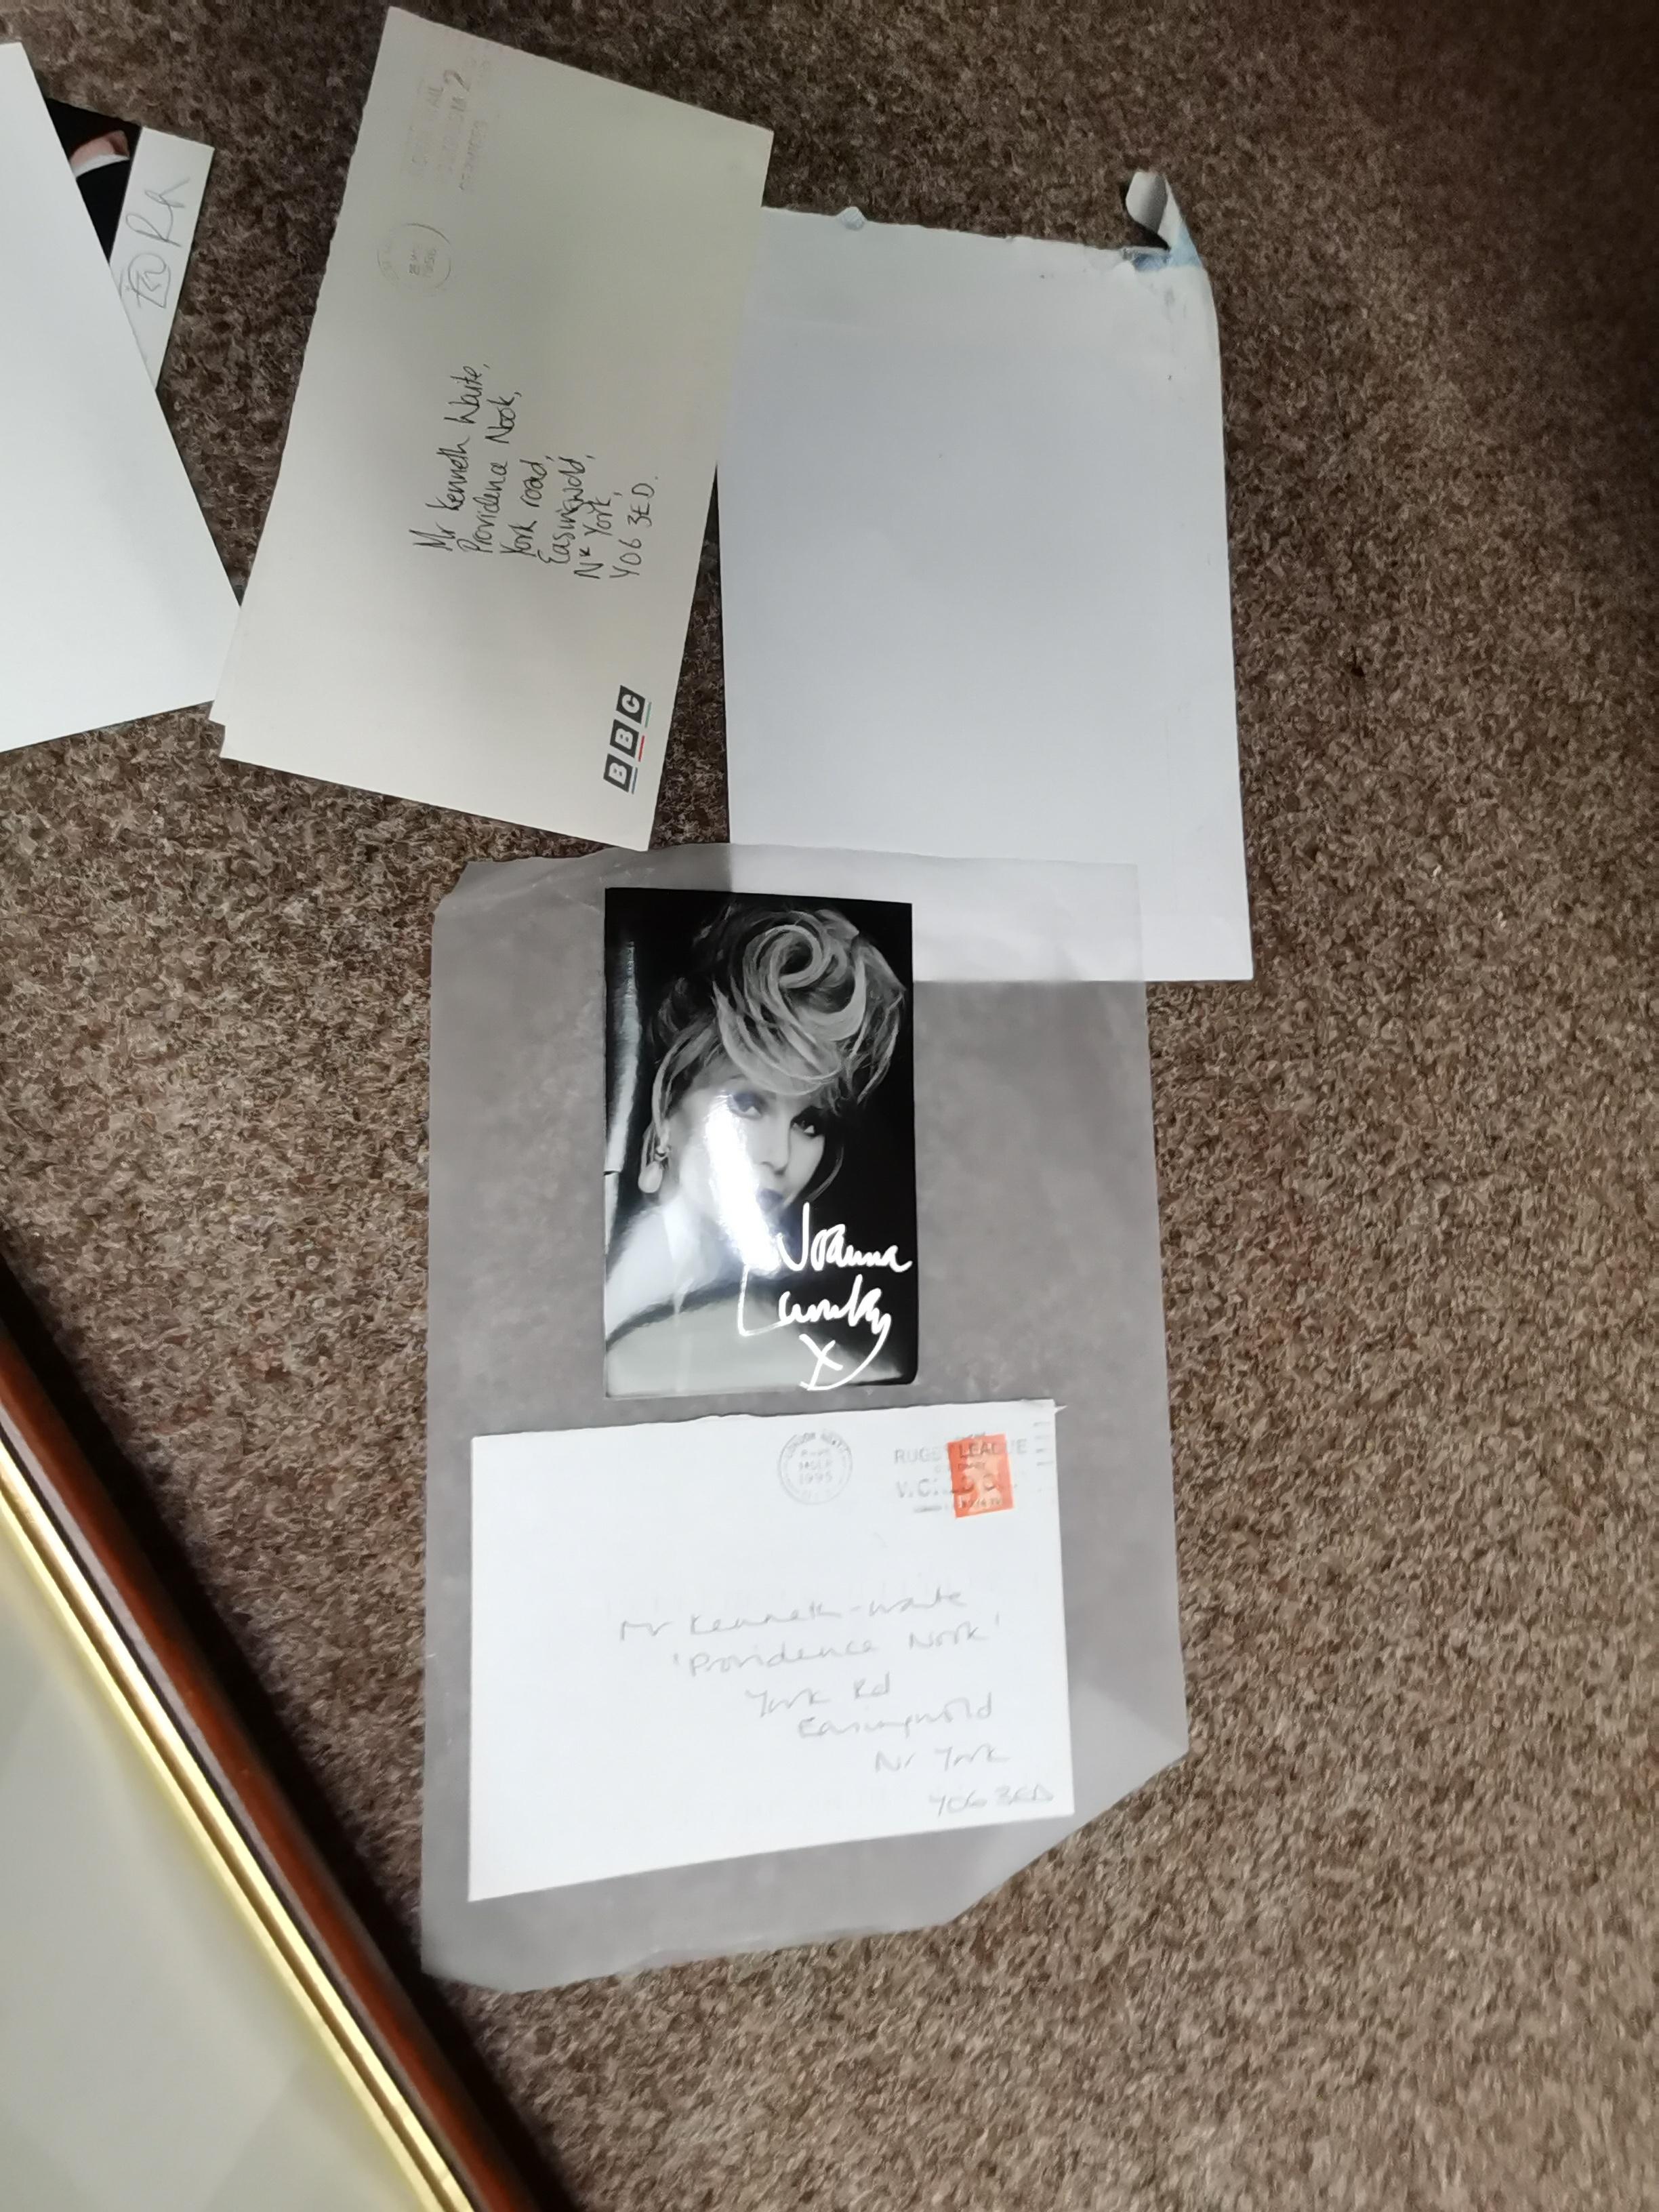 30 Plus Autographs In Folder - Image 4 of 7